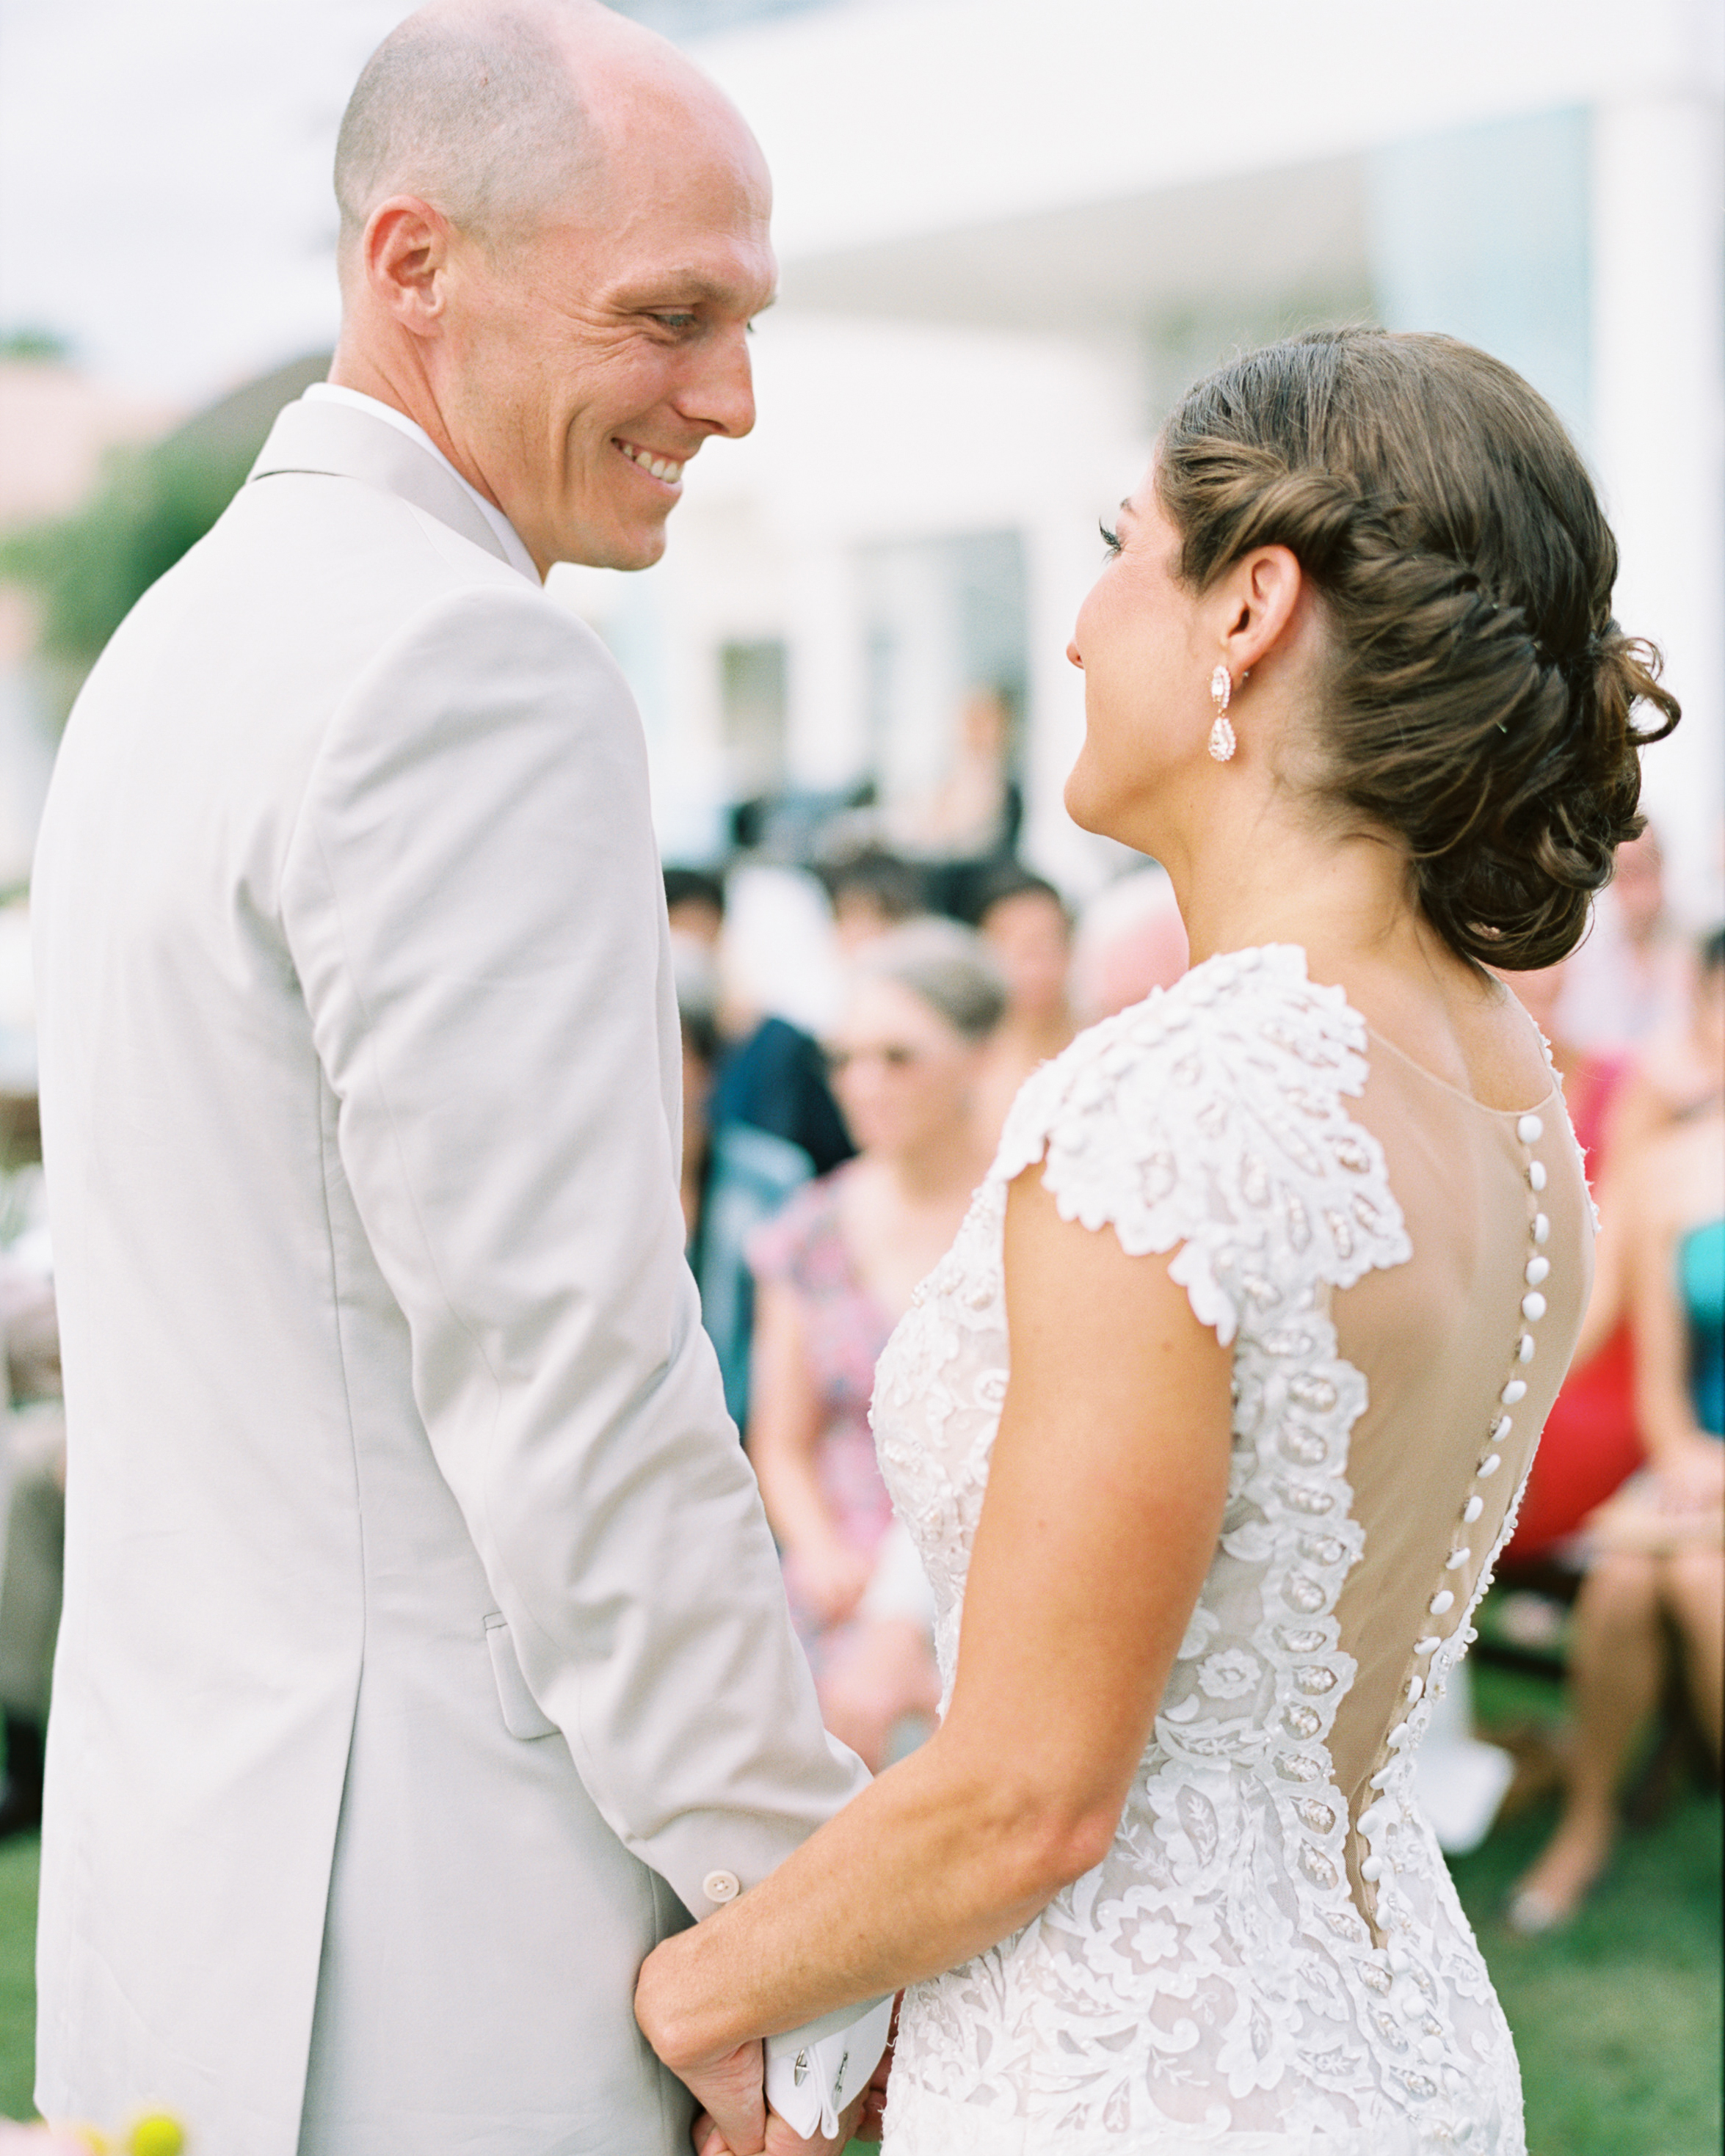 molly-nate-wedding-ceremony-154-s111479-0814.jpg